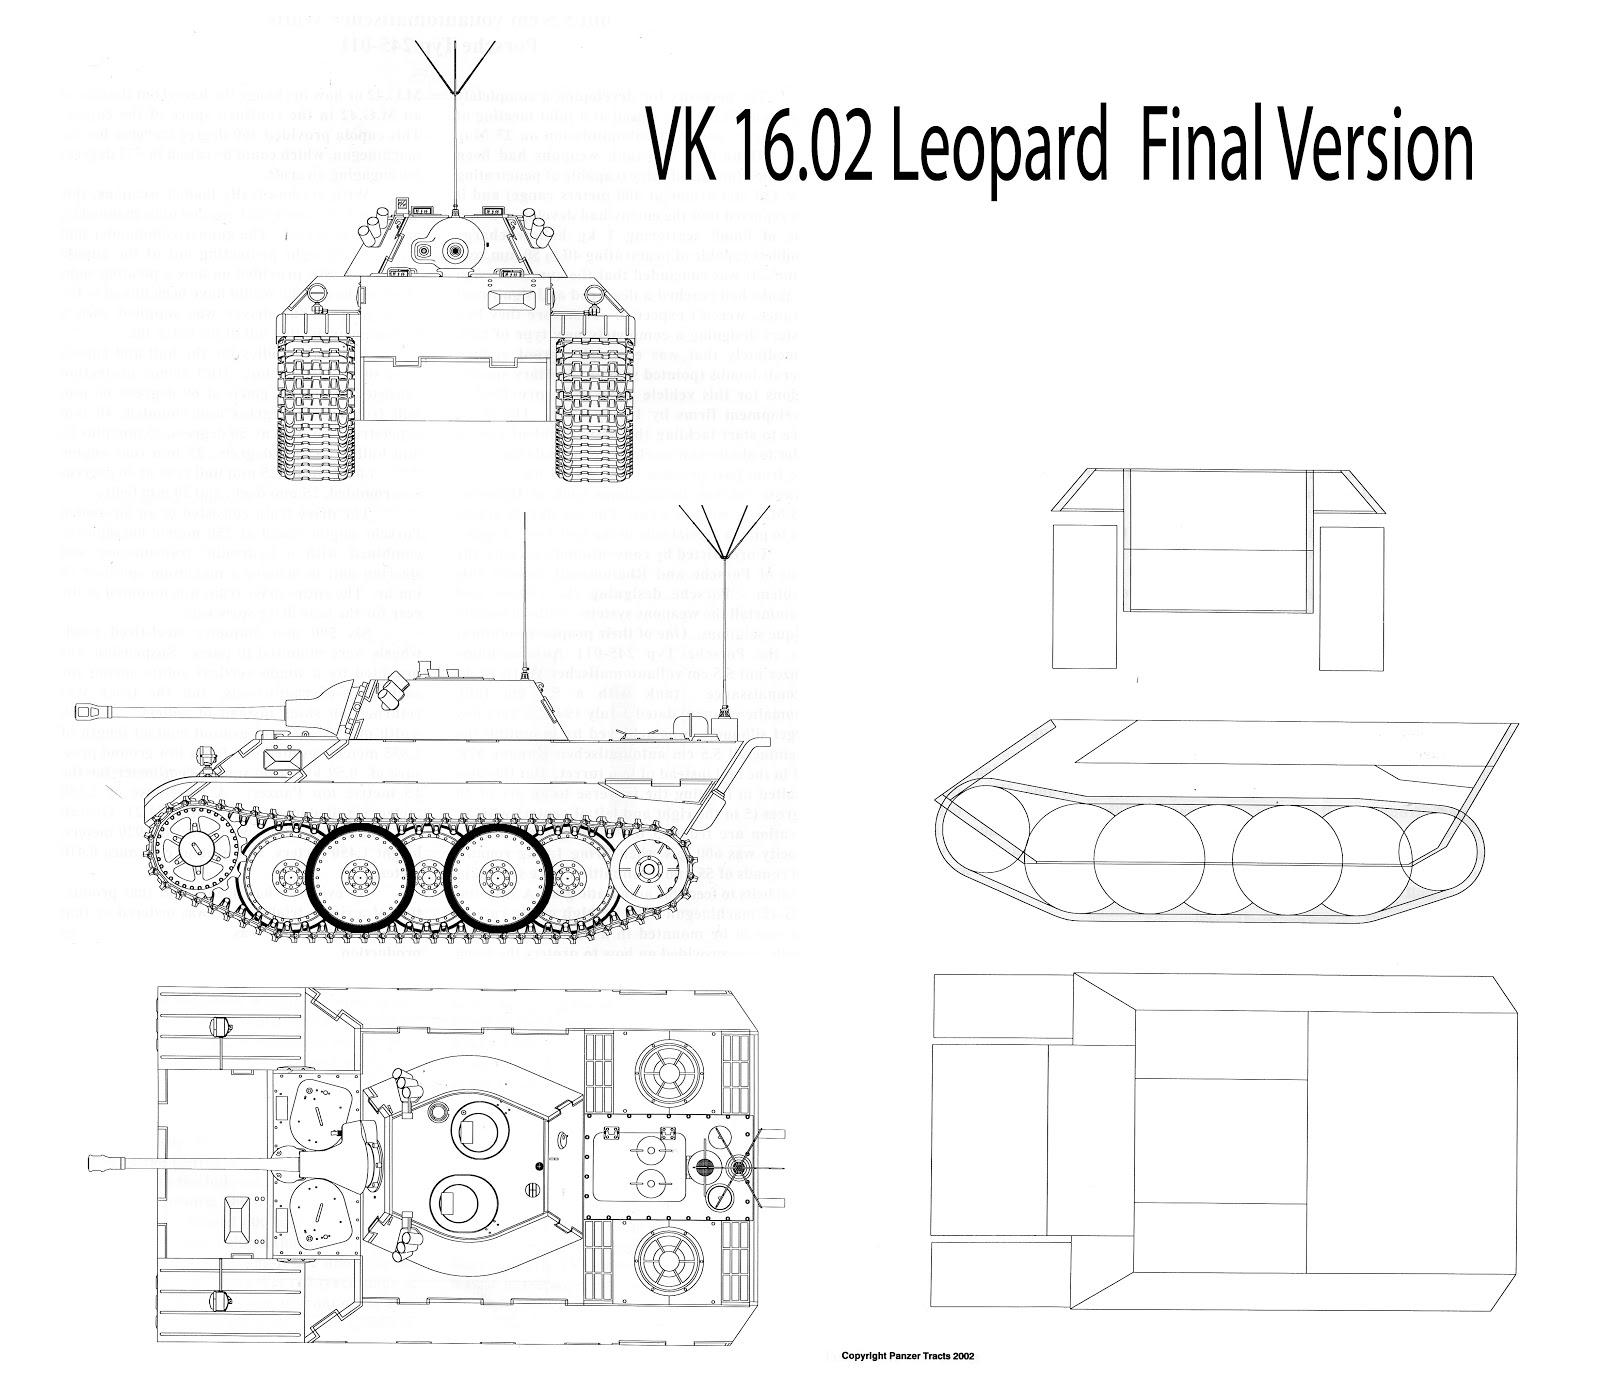 Modelos 3d vk 1602 leopard arriba prototipo 1 up prototype 1 malvernweather Images